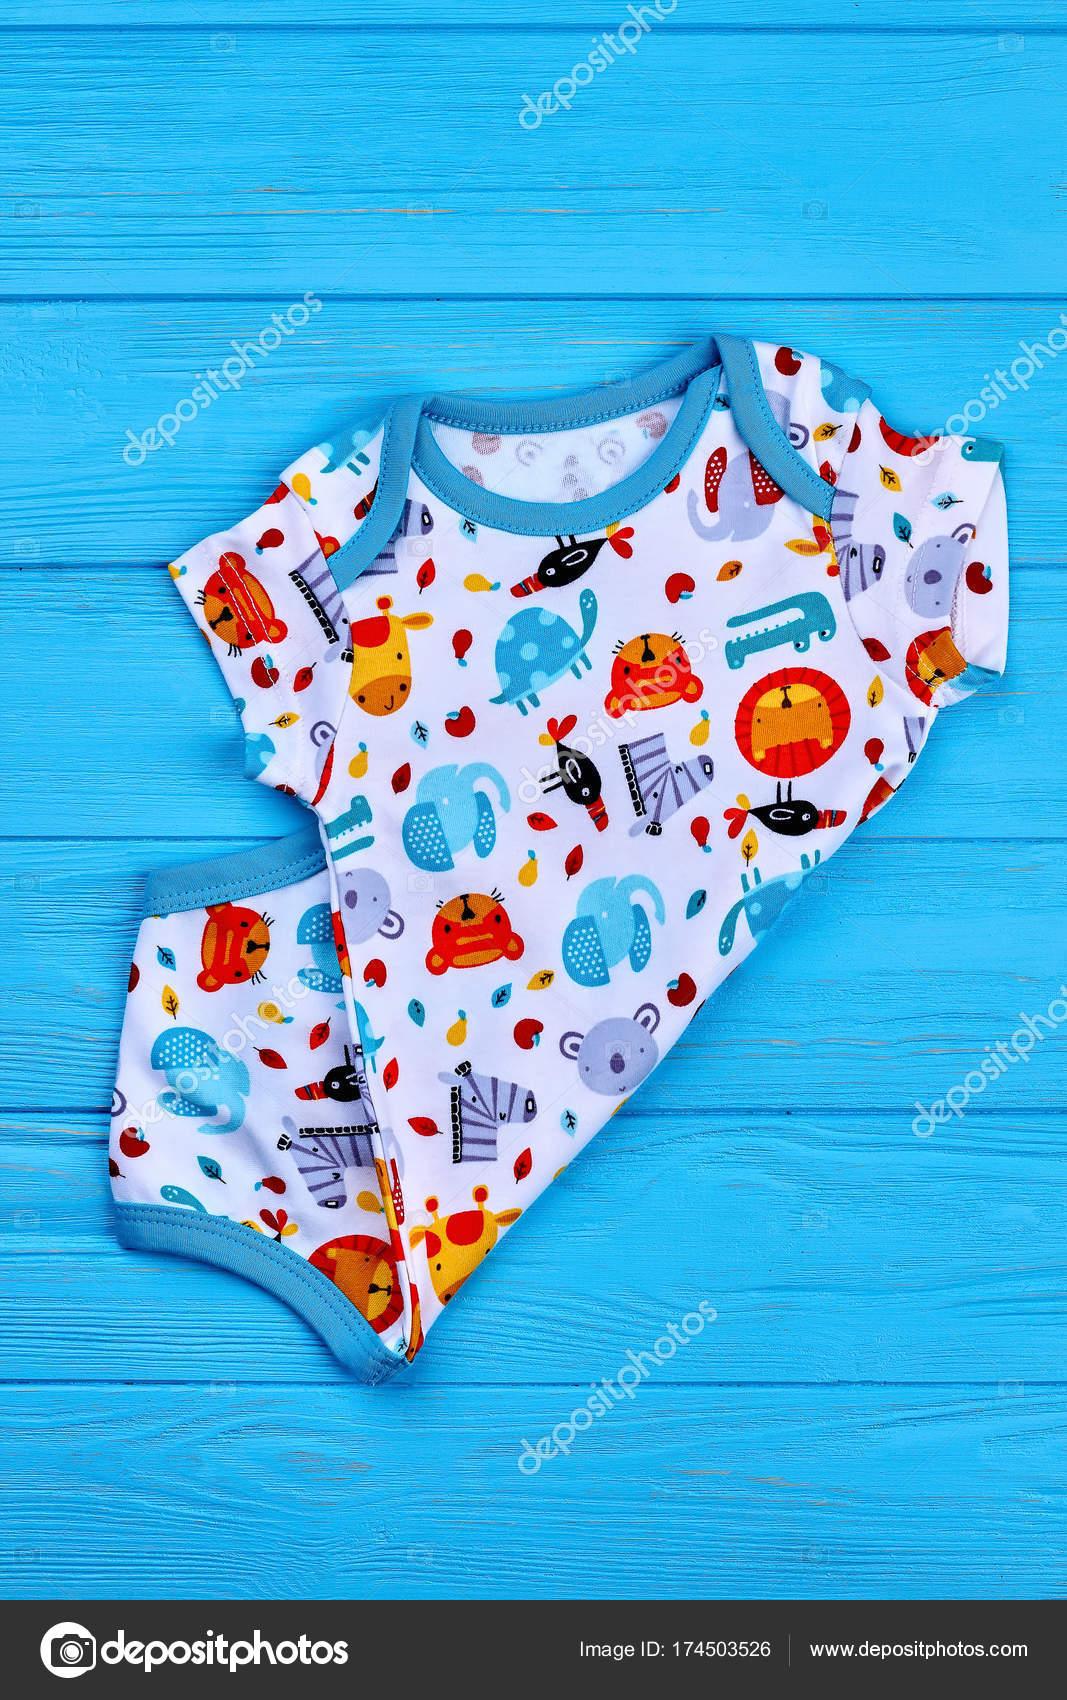 9b6e8b30b758 Top quality patterned baby bodysuit. — Stock Photo © Denisfilm ...